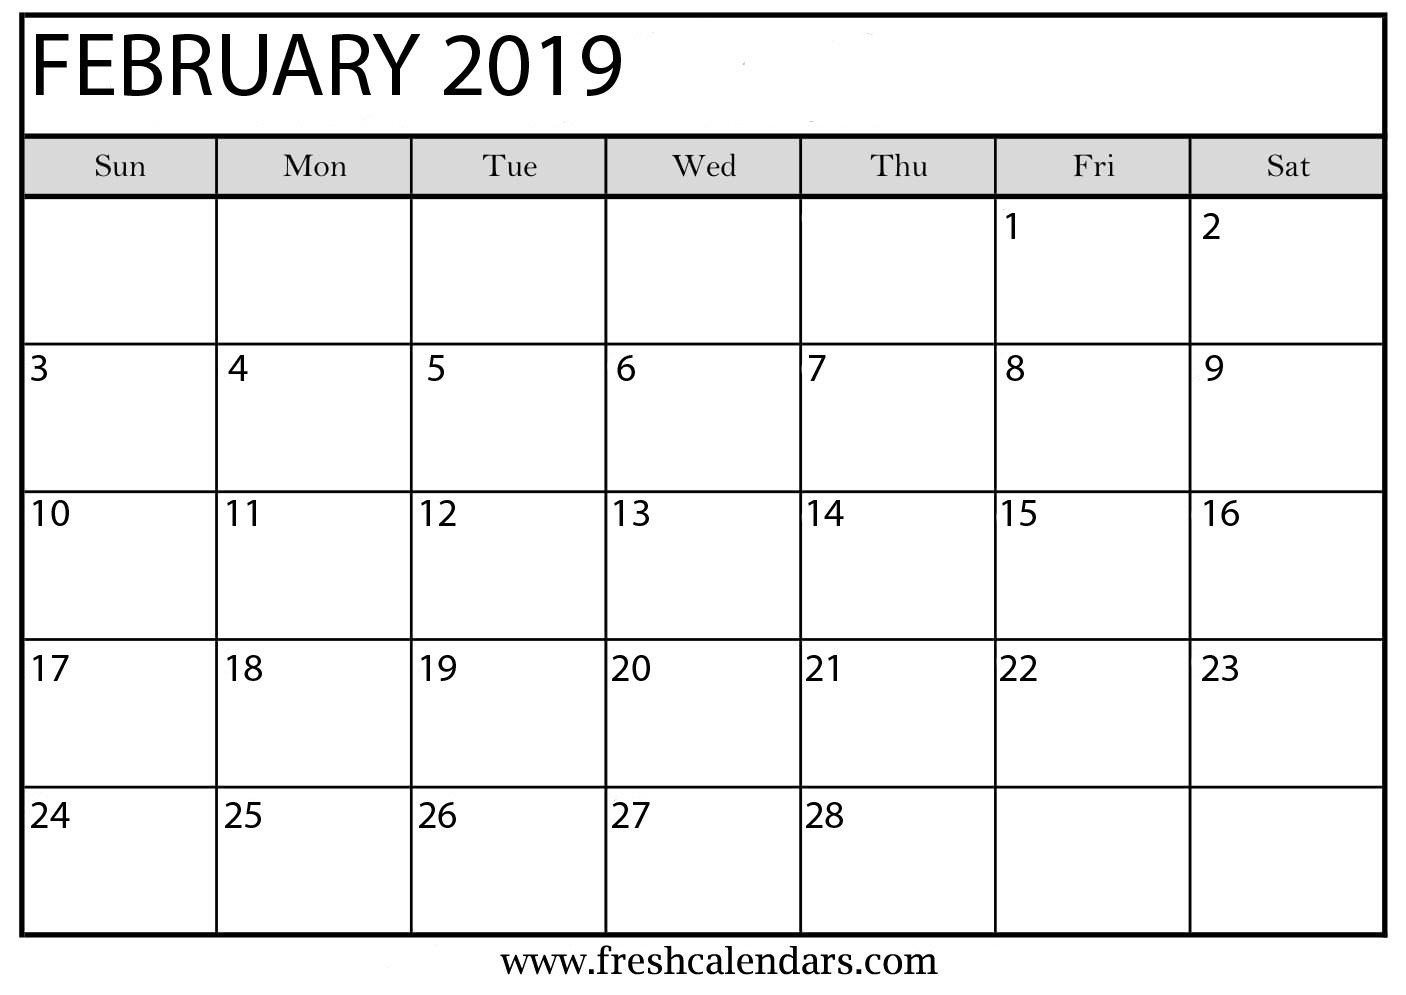 February 2019 Printable Calendars – Fresh Calendars Feb 5 2019 Calendar